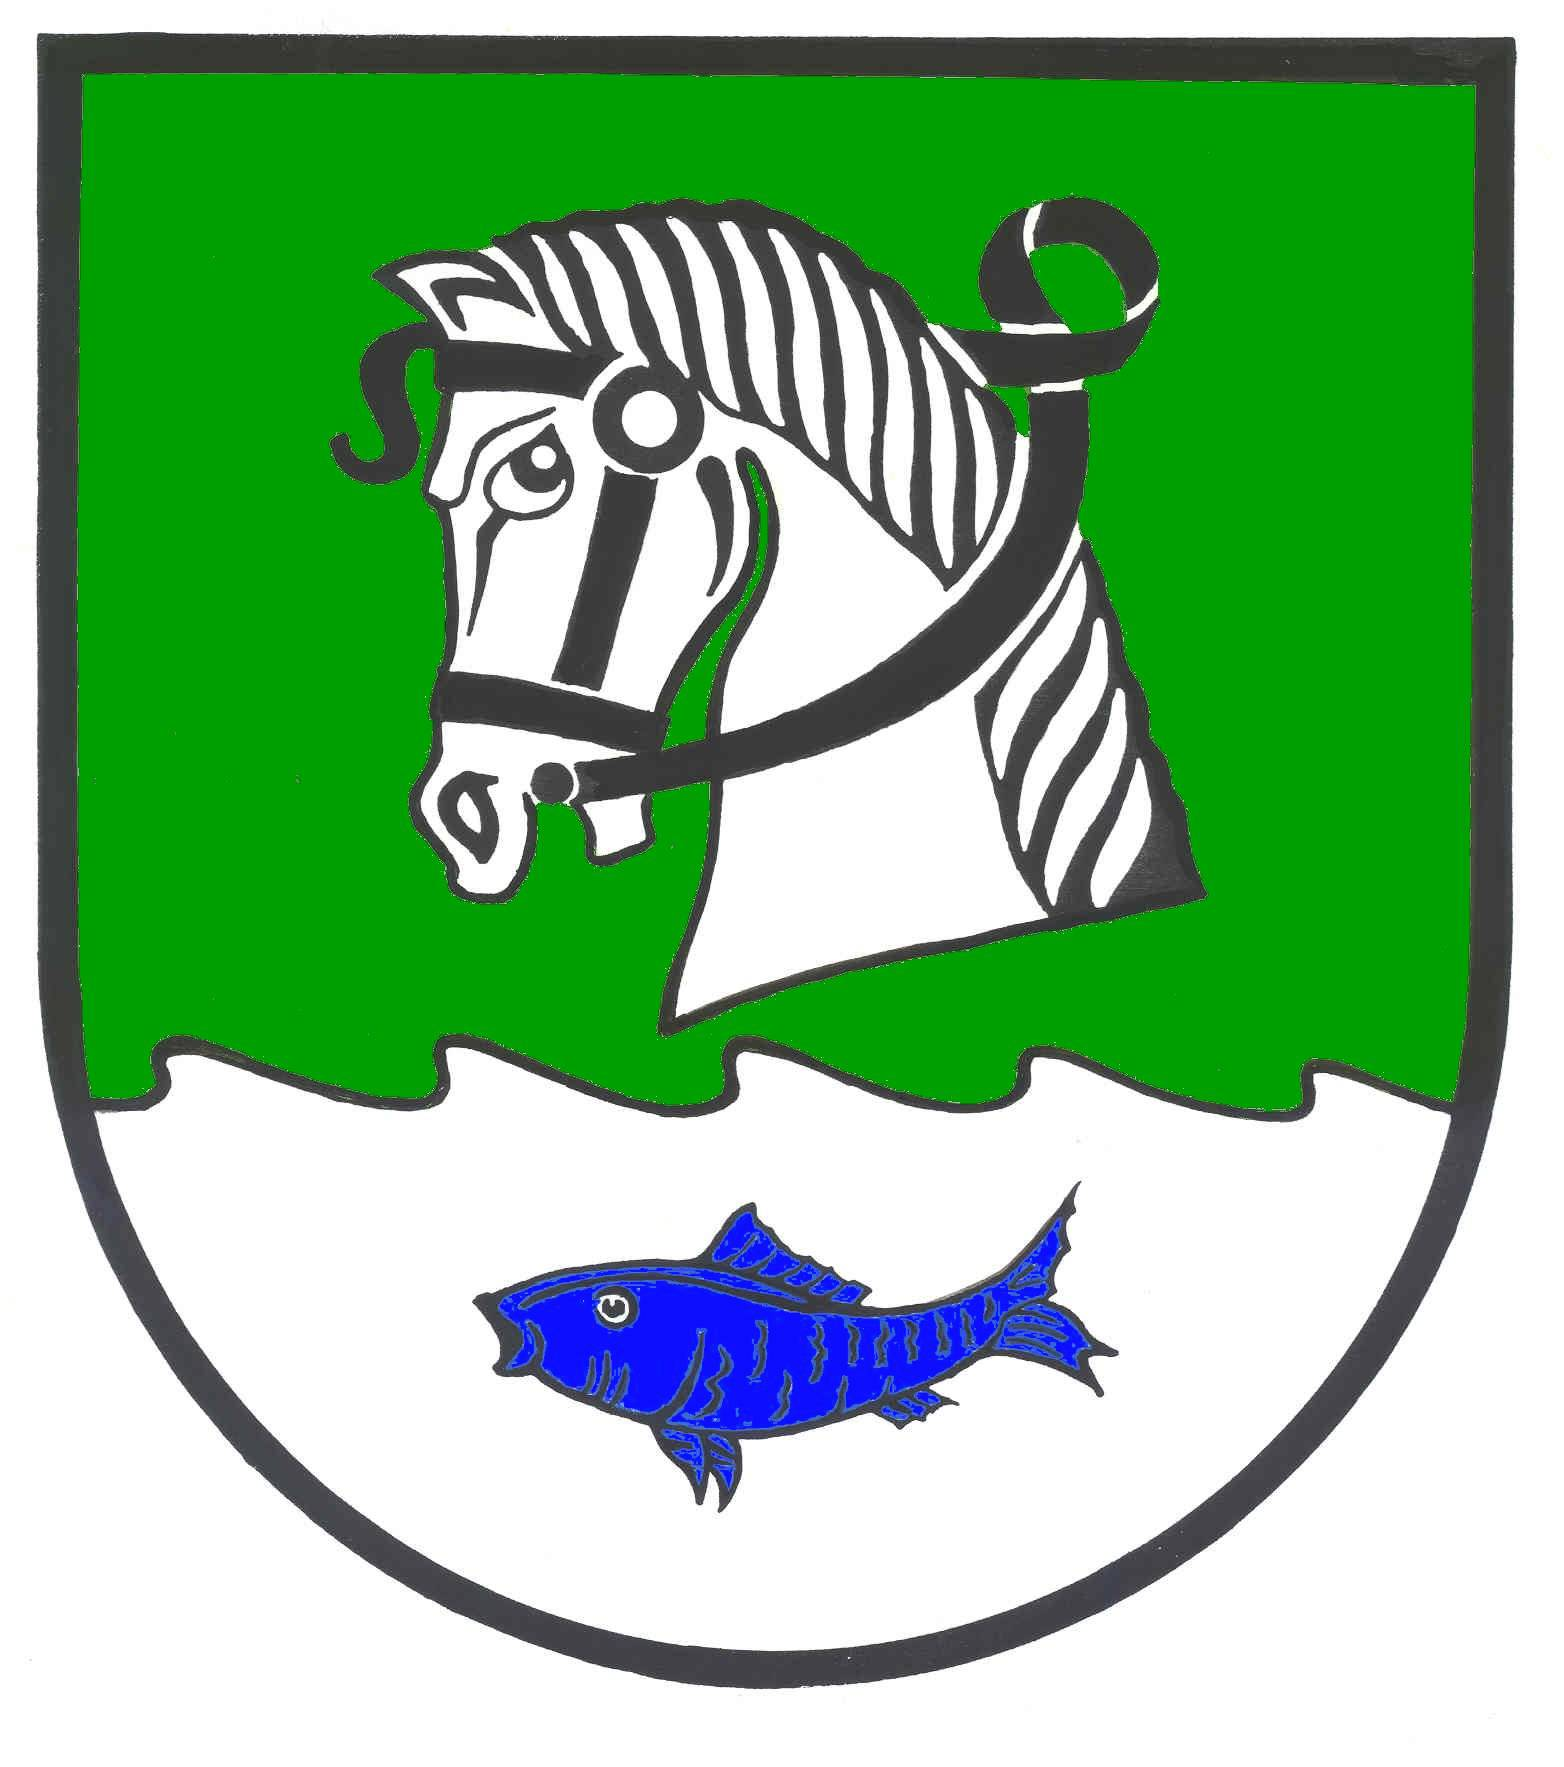 Wappen GemeindeGroven, Kreis Dithmarschen